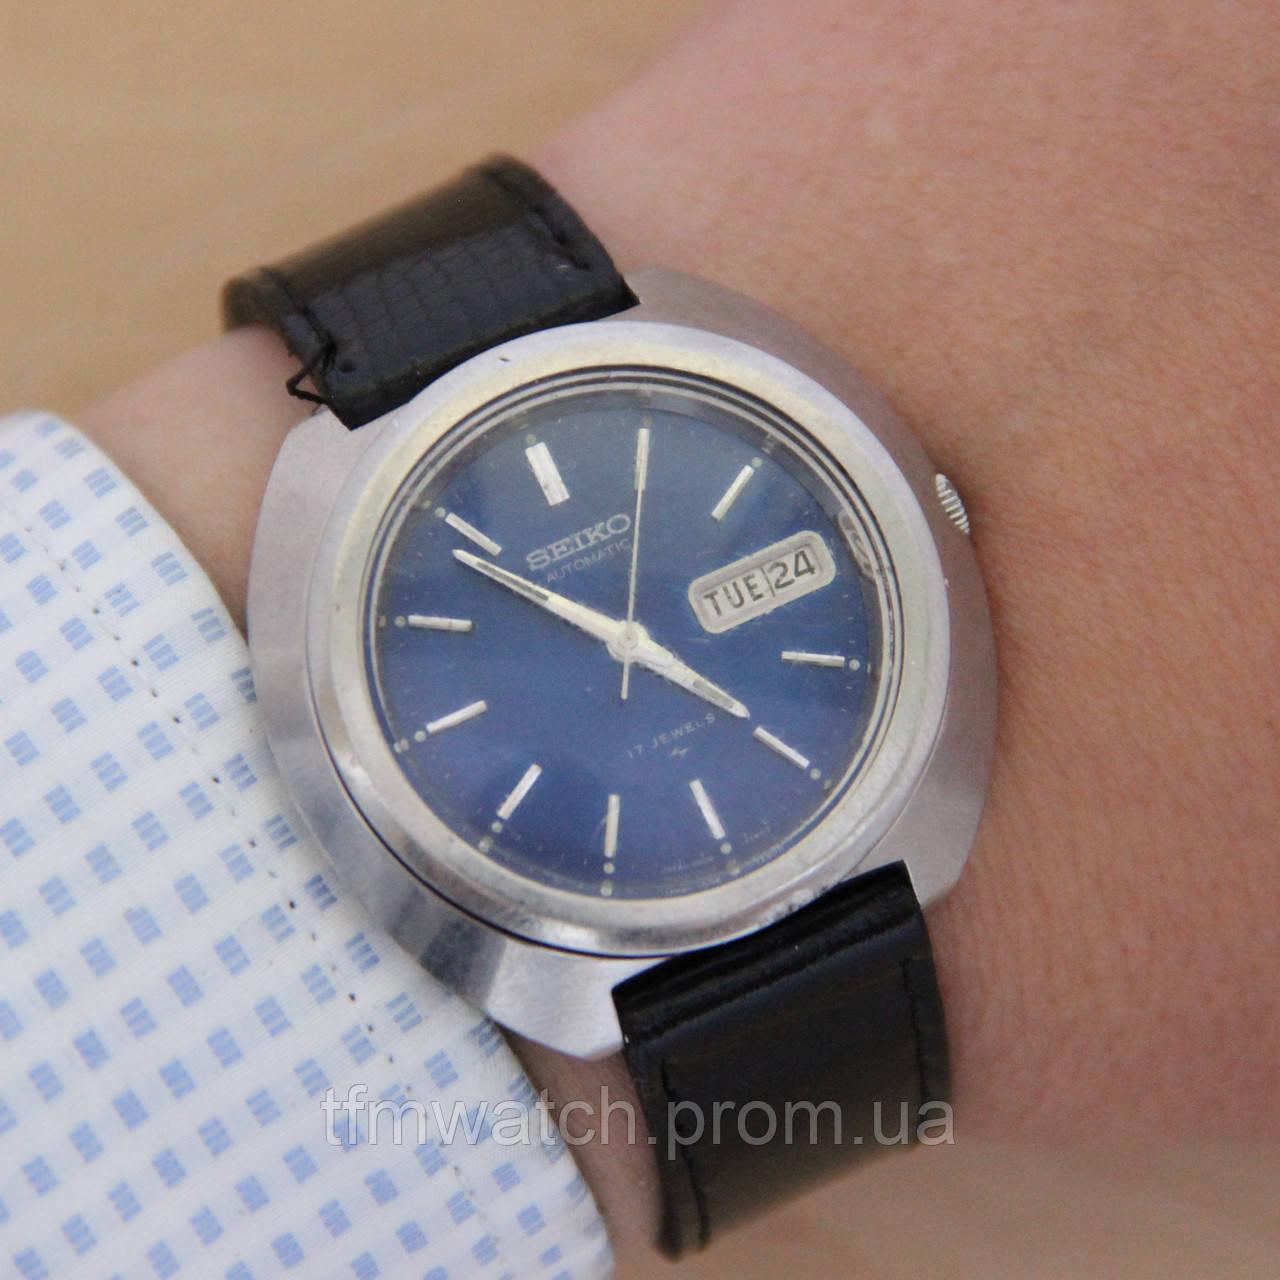 Подержанные часы Seiko Vintage